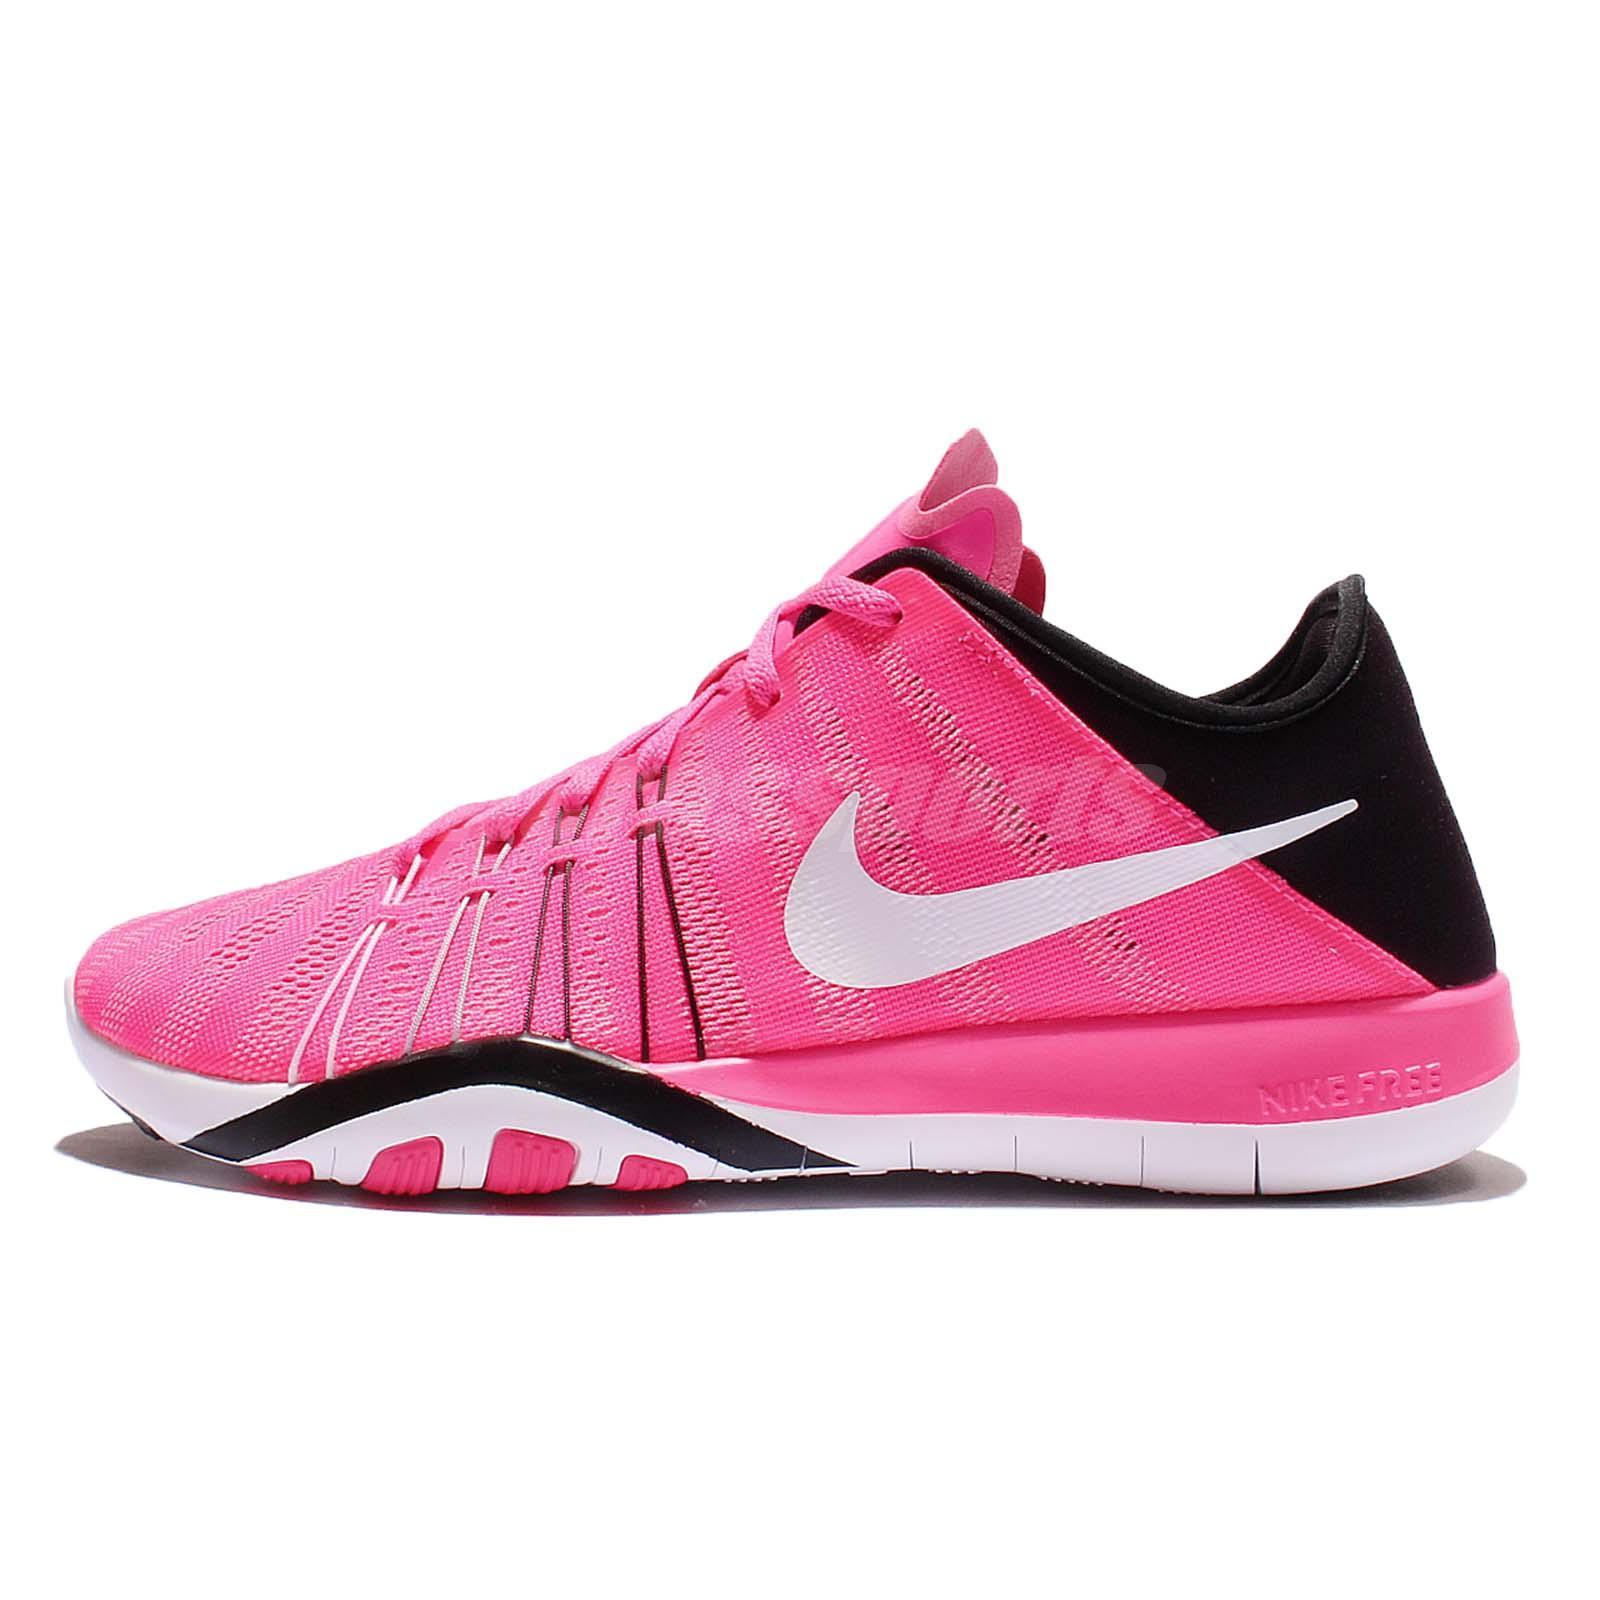 Jordan Wedge Sneakers Black Nike Zoom Lebron XII 12 Men Basketball Shoes  Light Purple Black Orange 6c3ed658eb